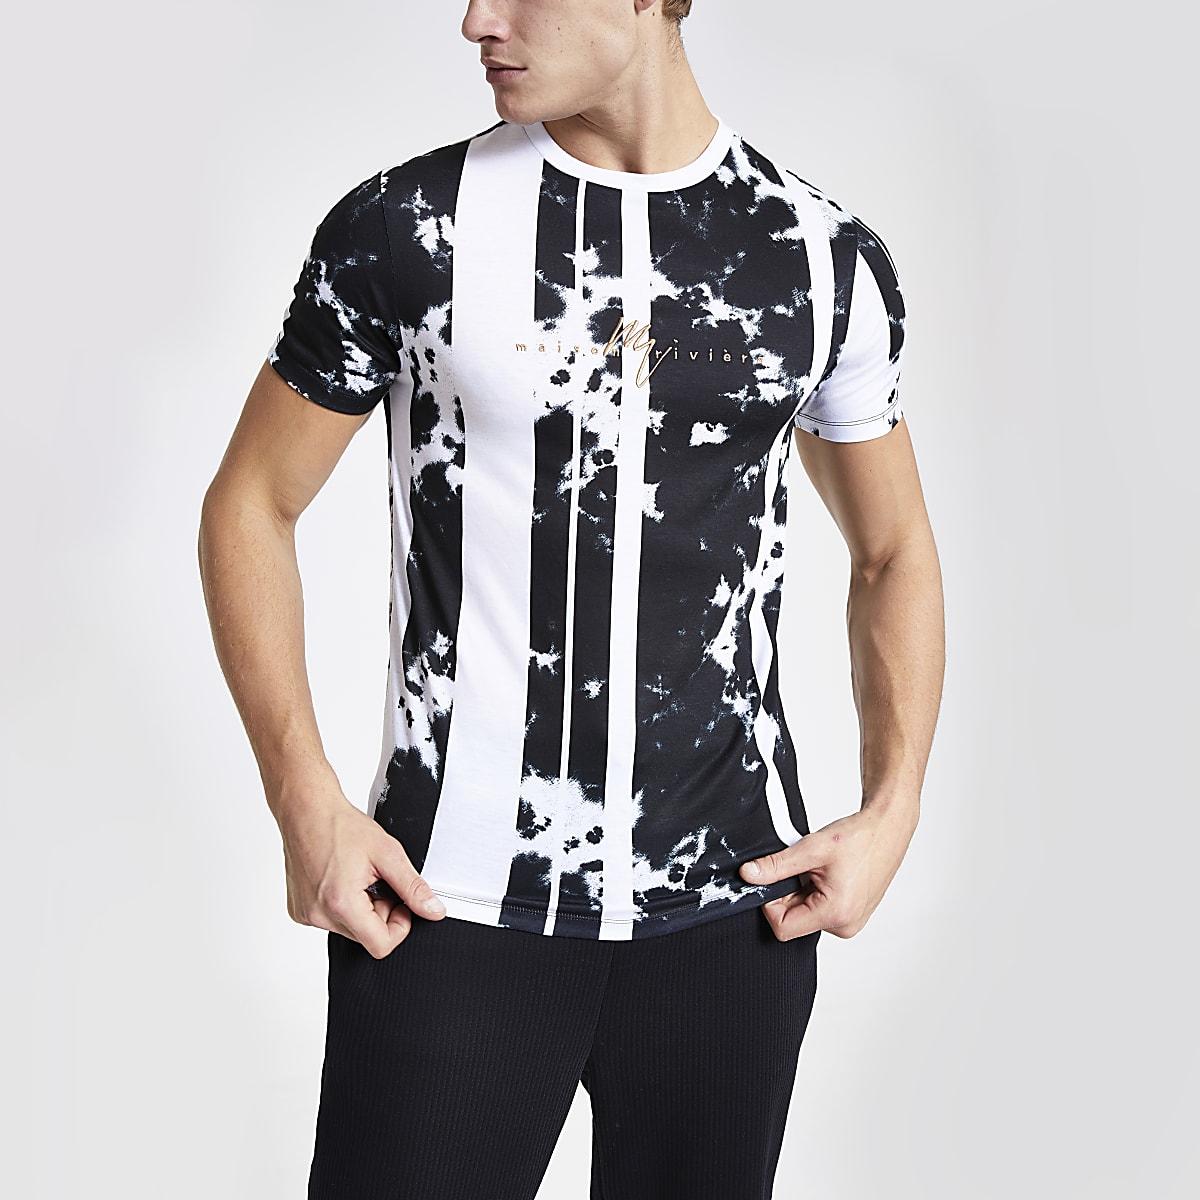 Maison Riviera white print muscle fit T-shirt